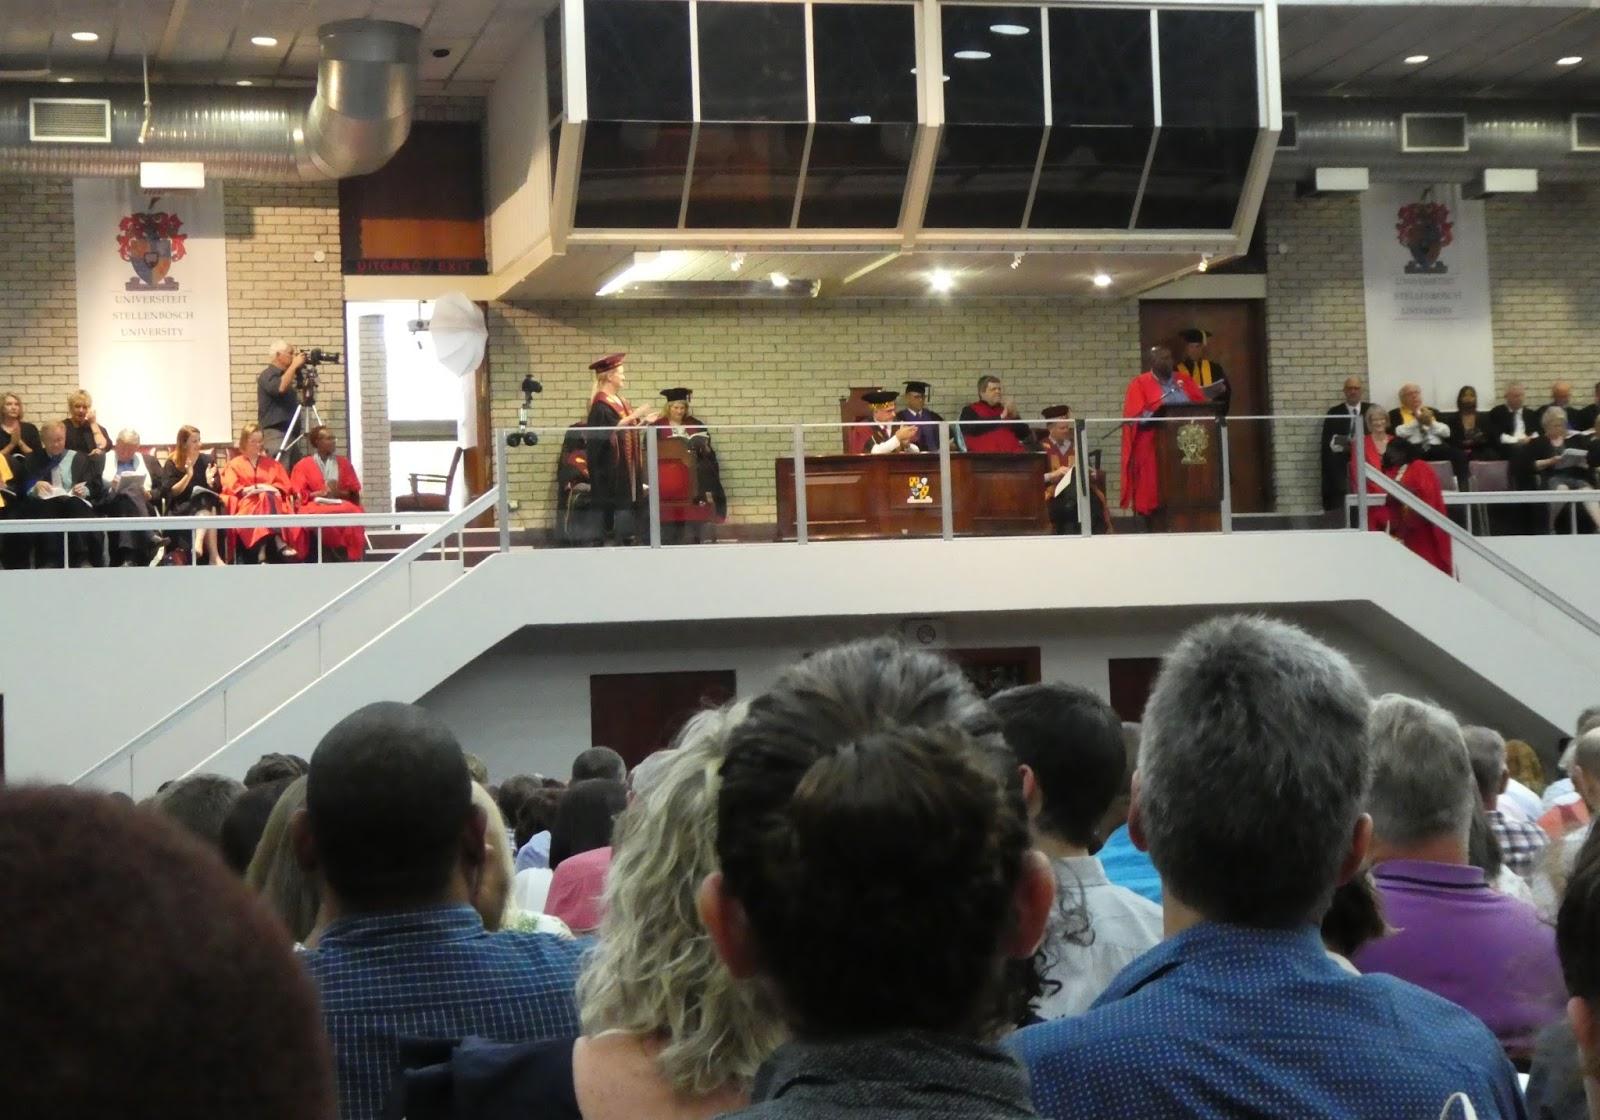 WEBS OF SIGNIFICANCE: Stellenbosch University graduation